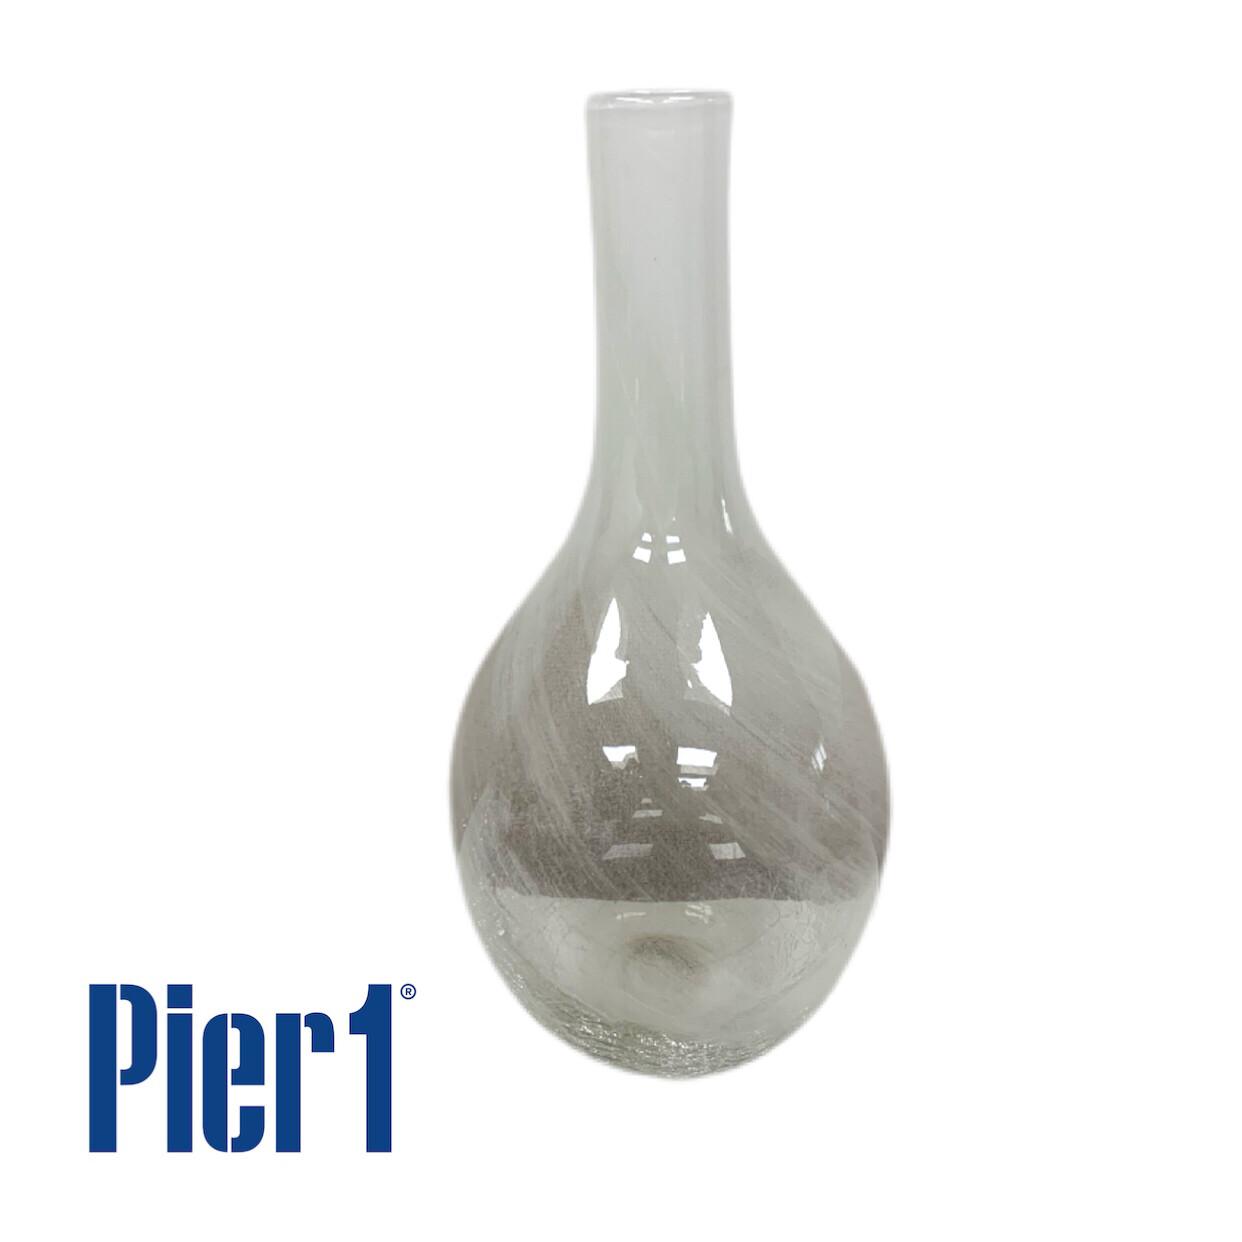 Clear Crackle Finish Vase